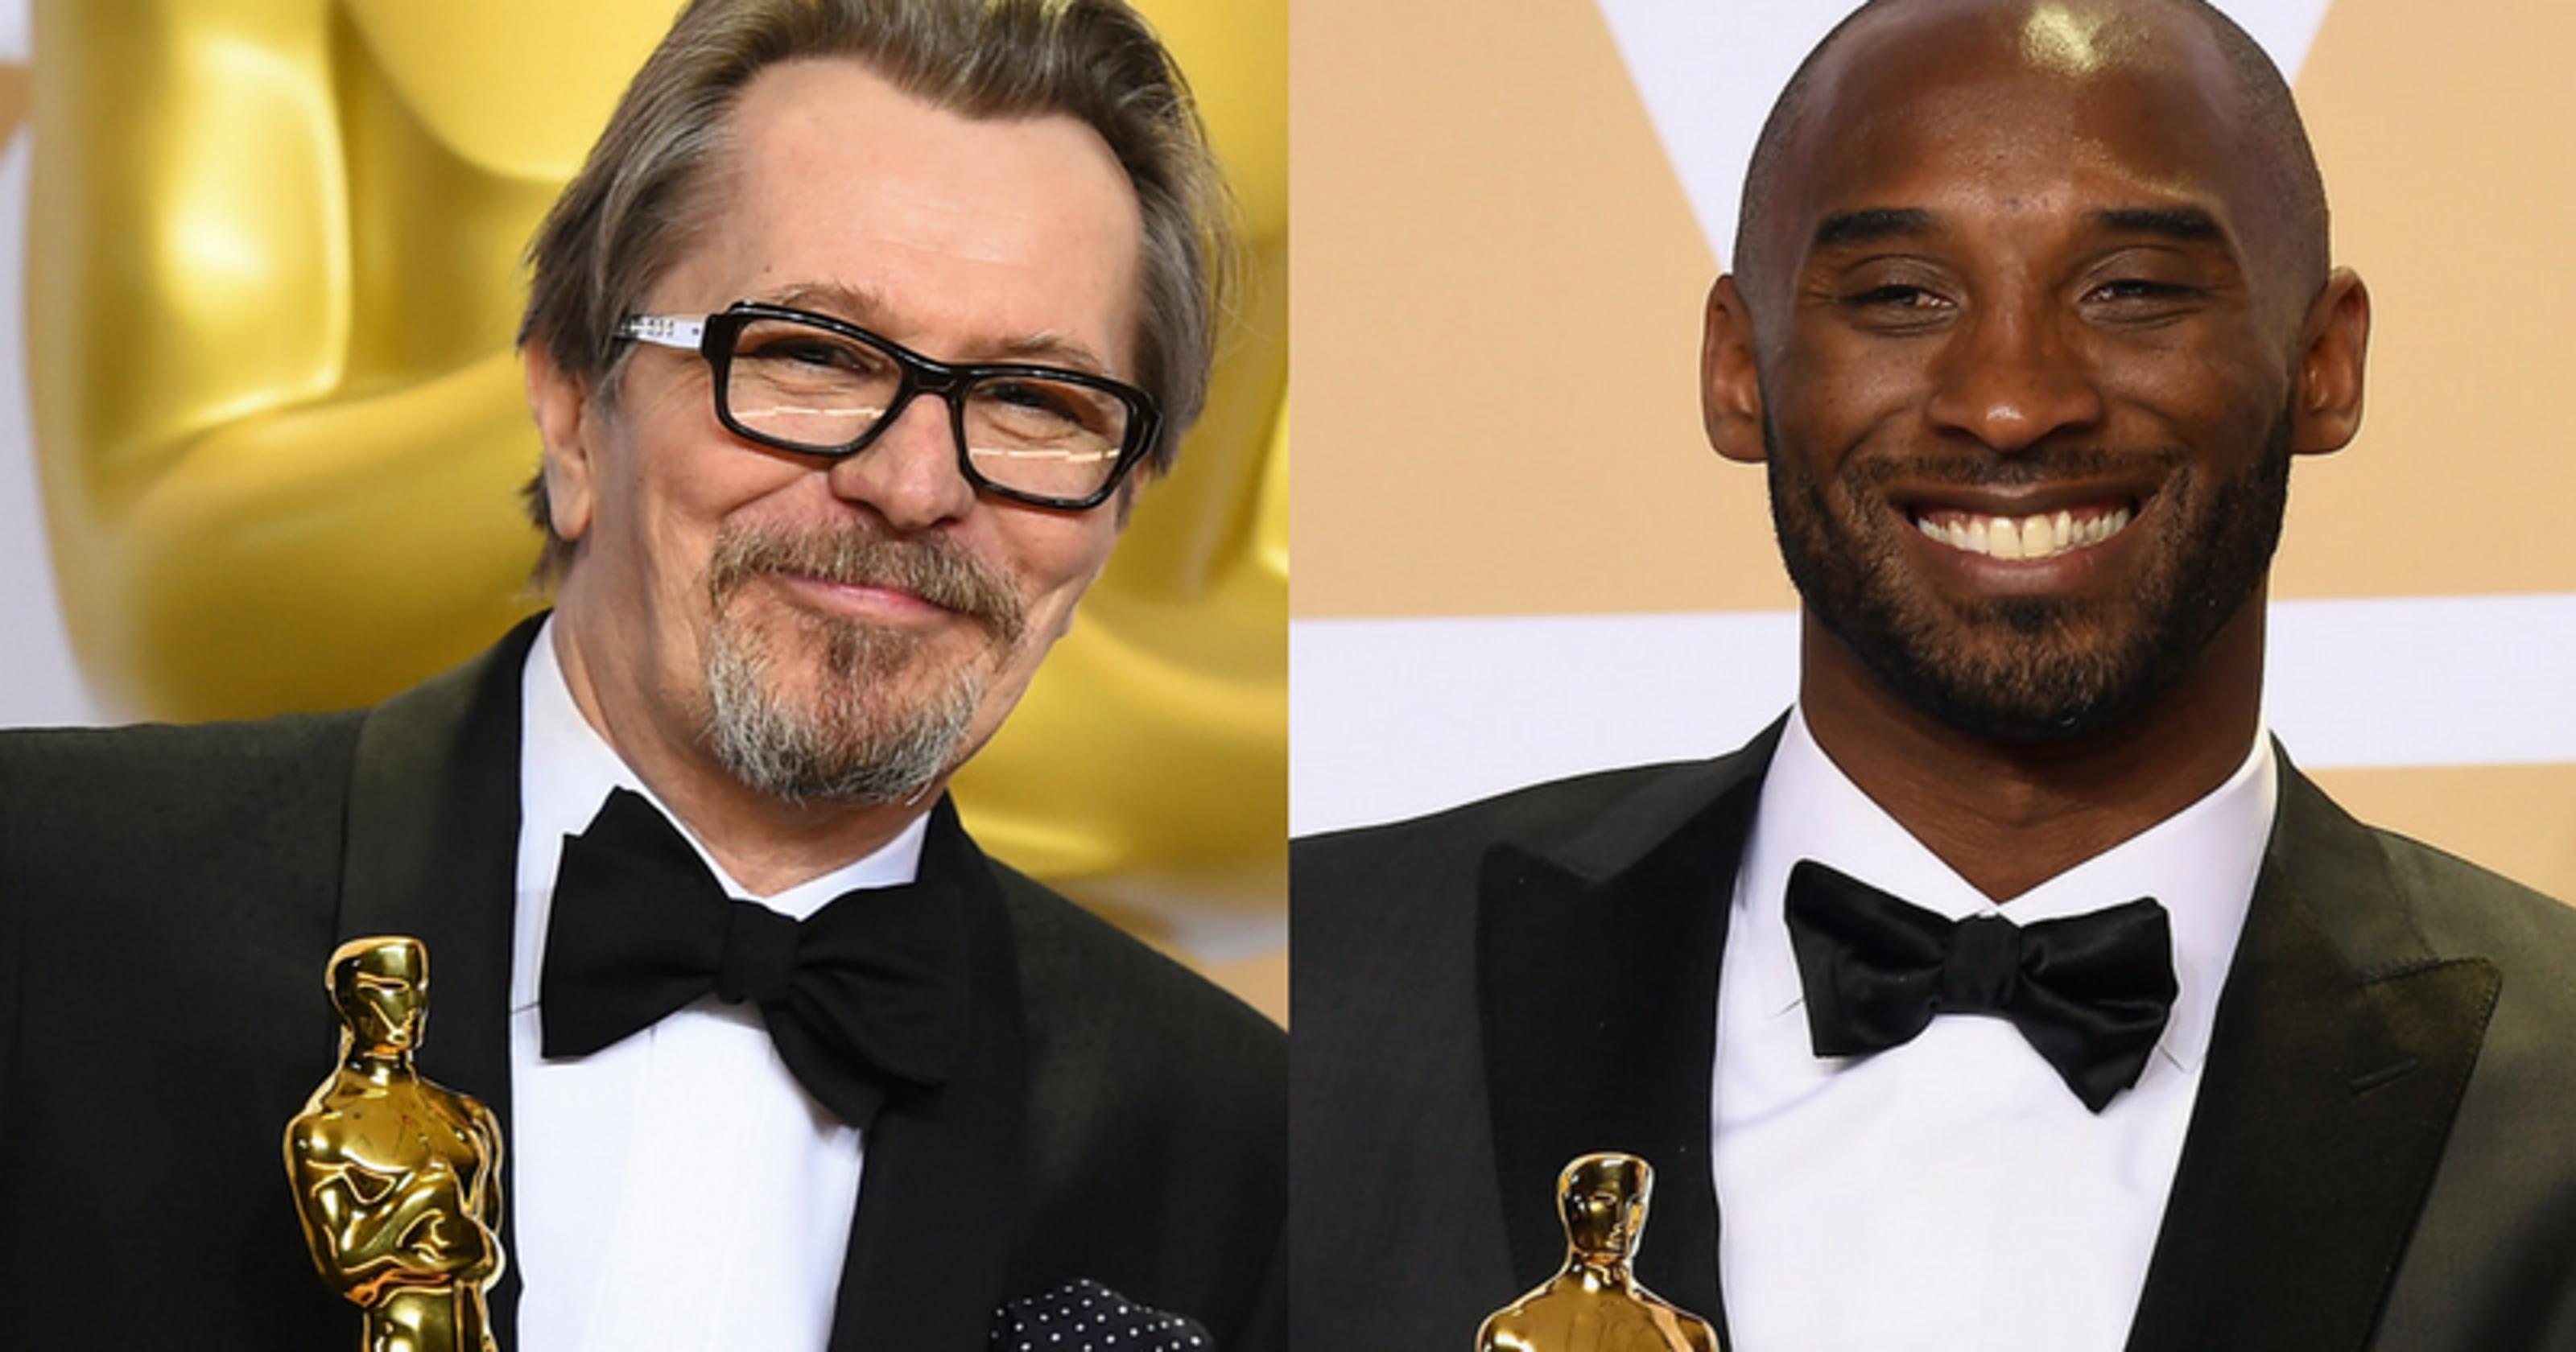 Why Gary Oldman's and Kobe Bryant's Oscar wins were tragic